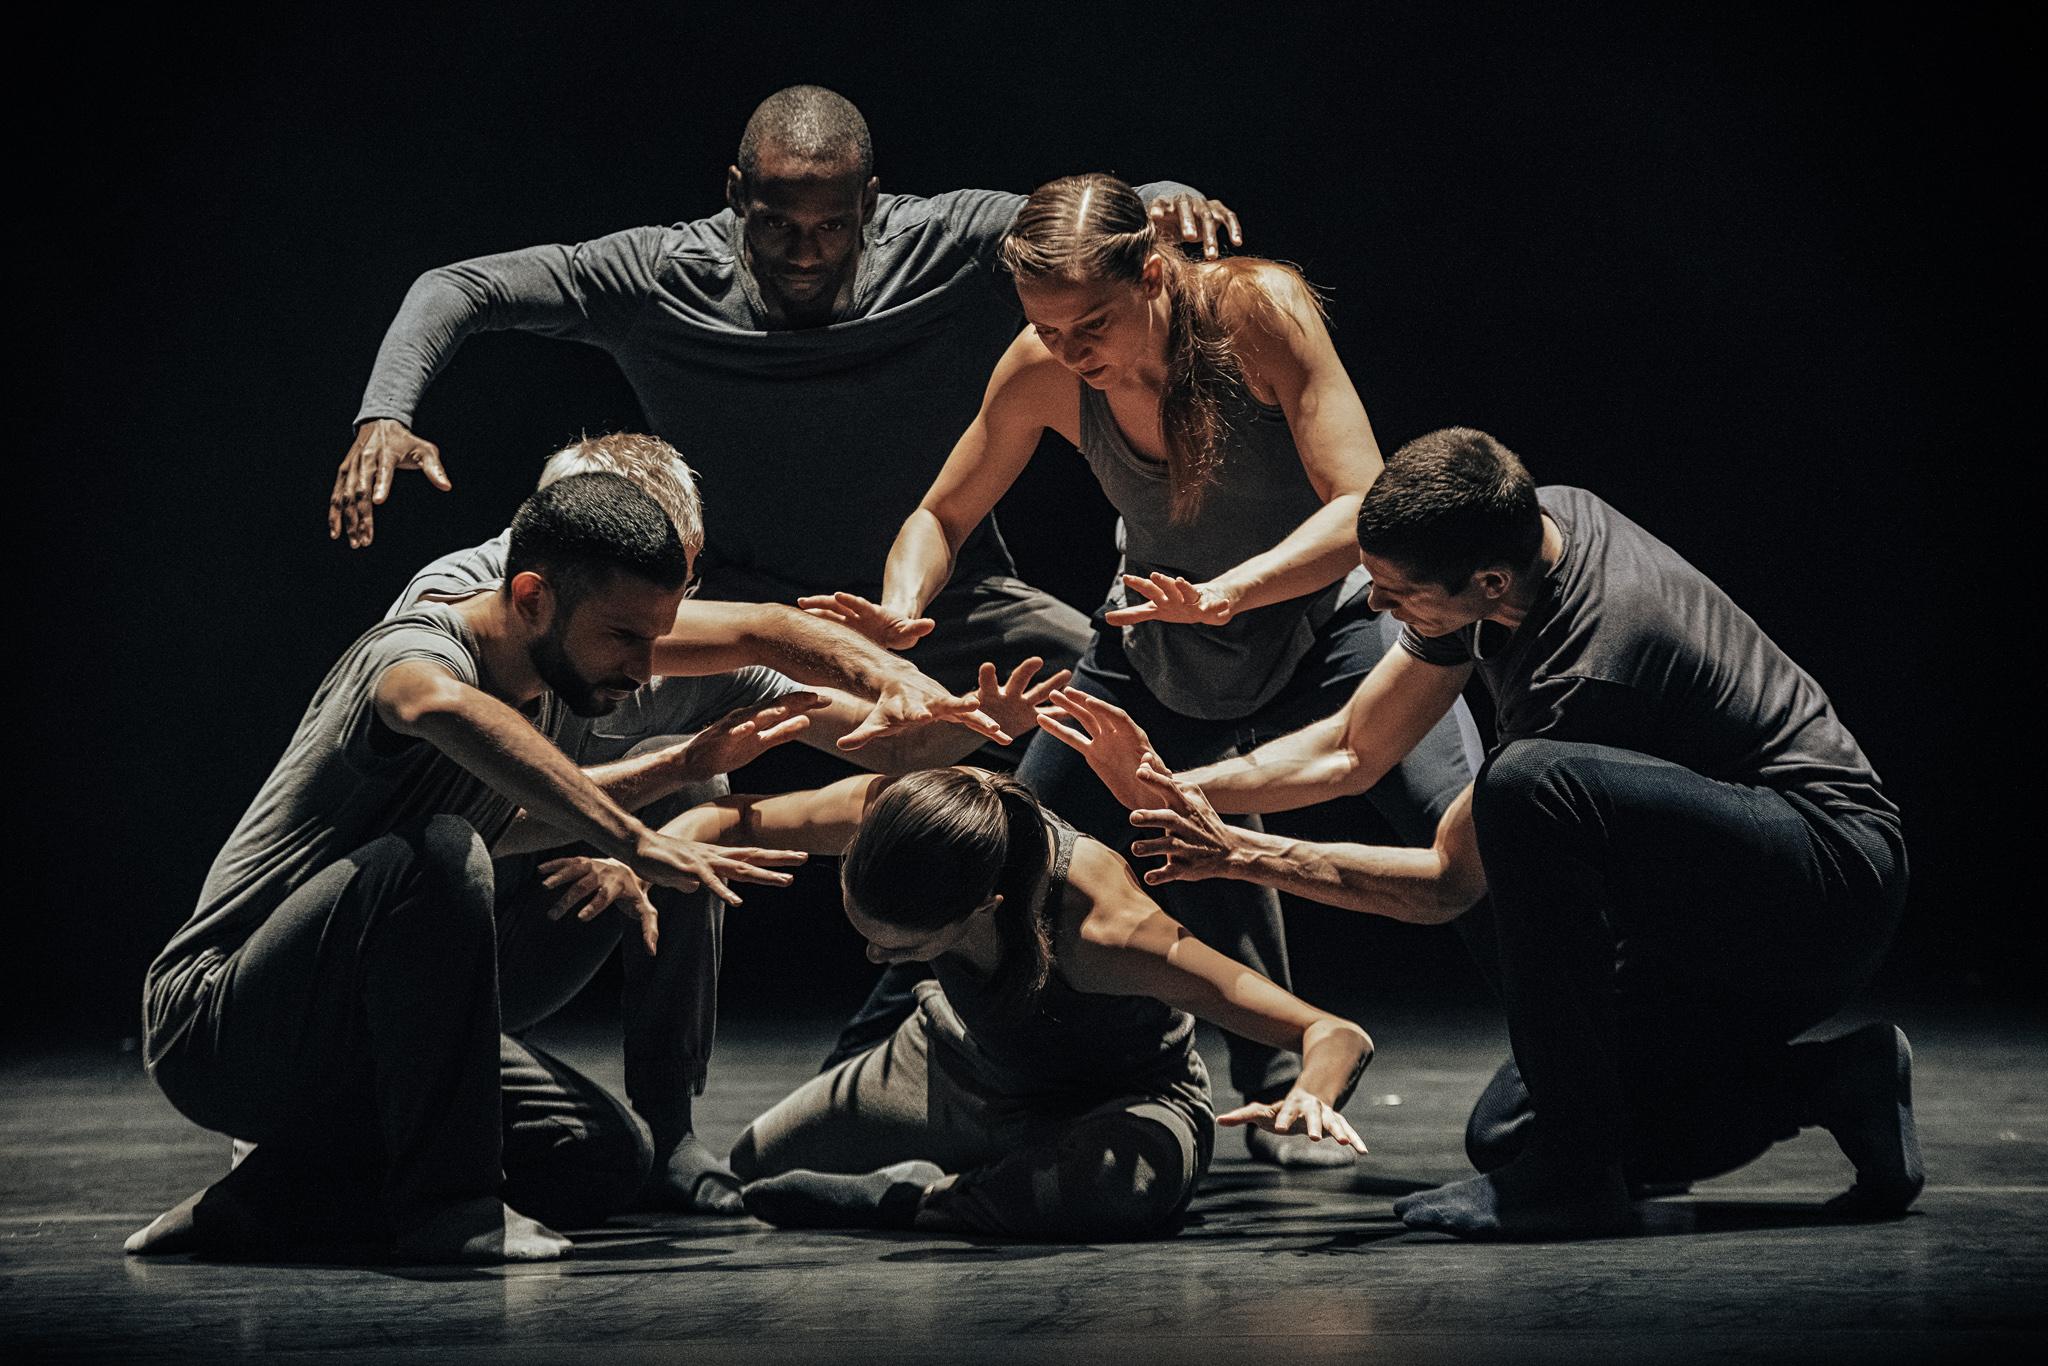 Kidd Pivot Crystal Pite dance photography, fotografia de escena, fotografo de danza, dance photographer, stage photography